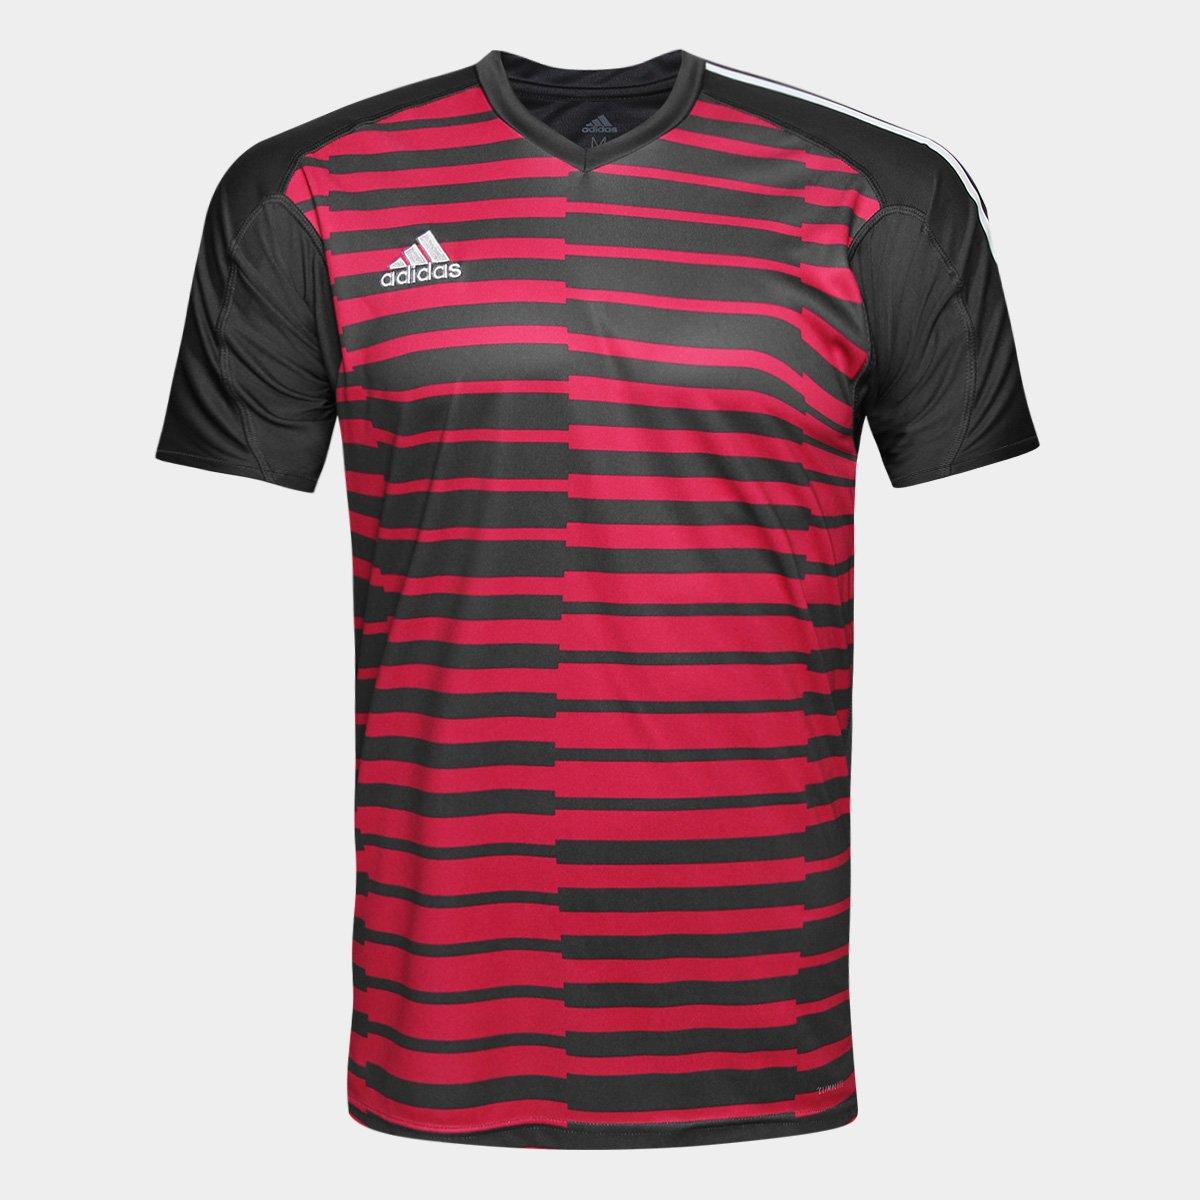 97fade79236 Camisa Adidas Goleiro Adipro 18 Masculina - Compre Agora